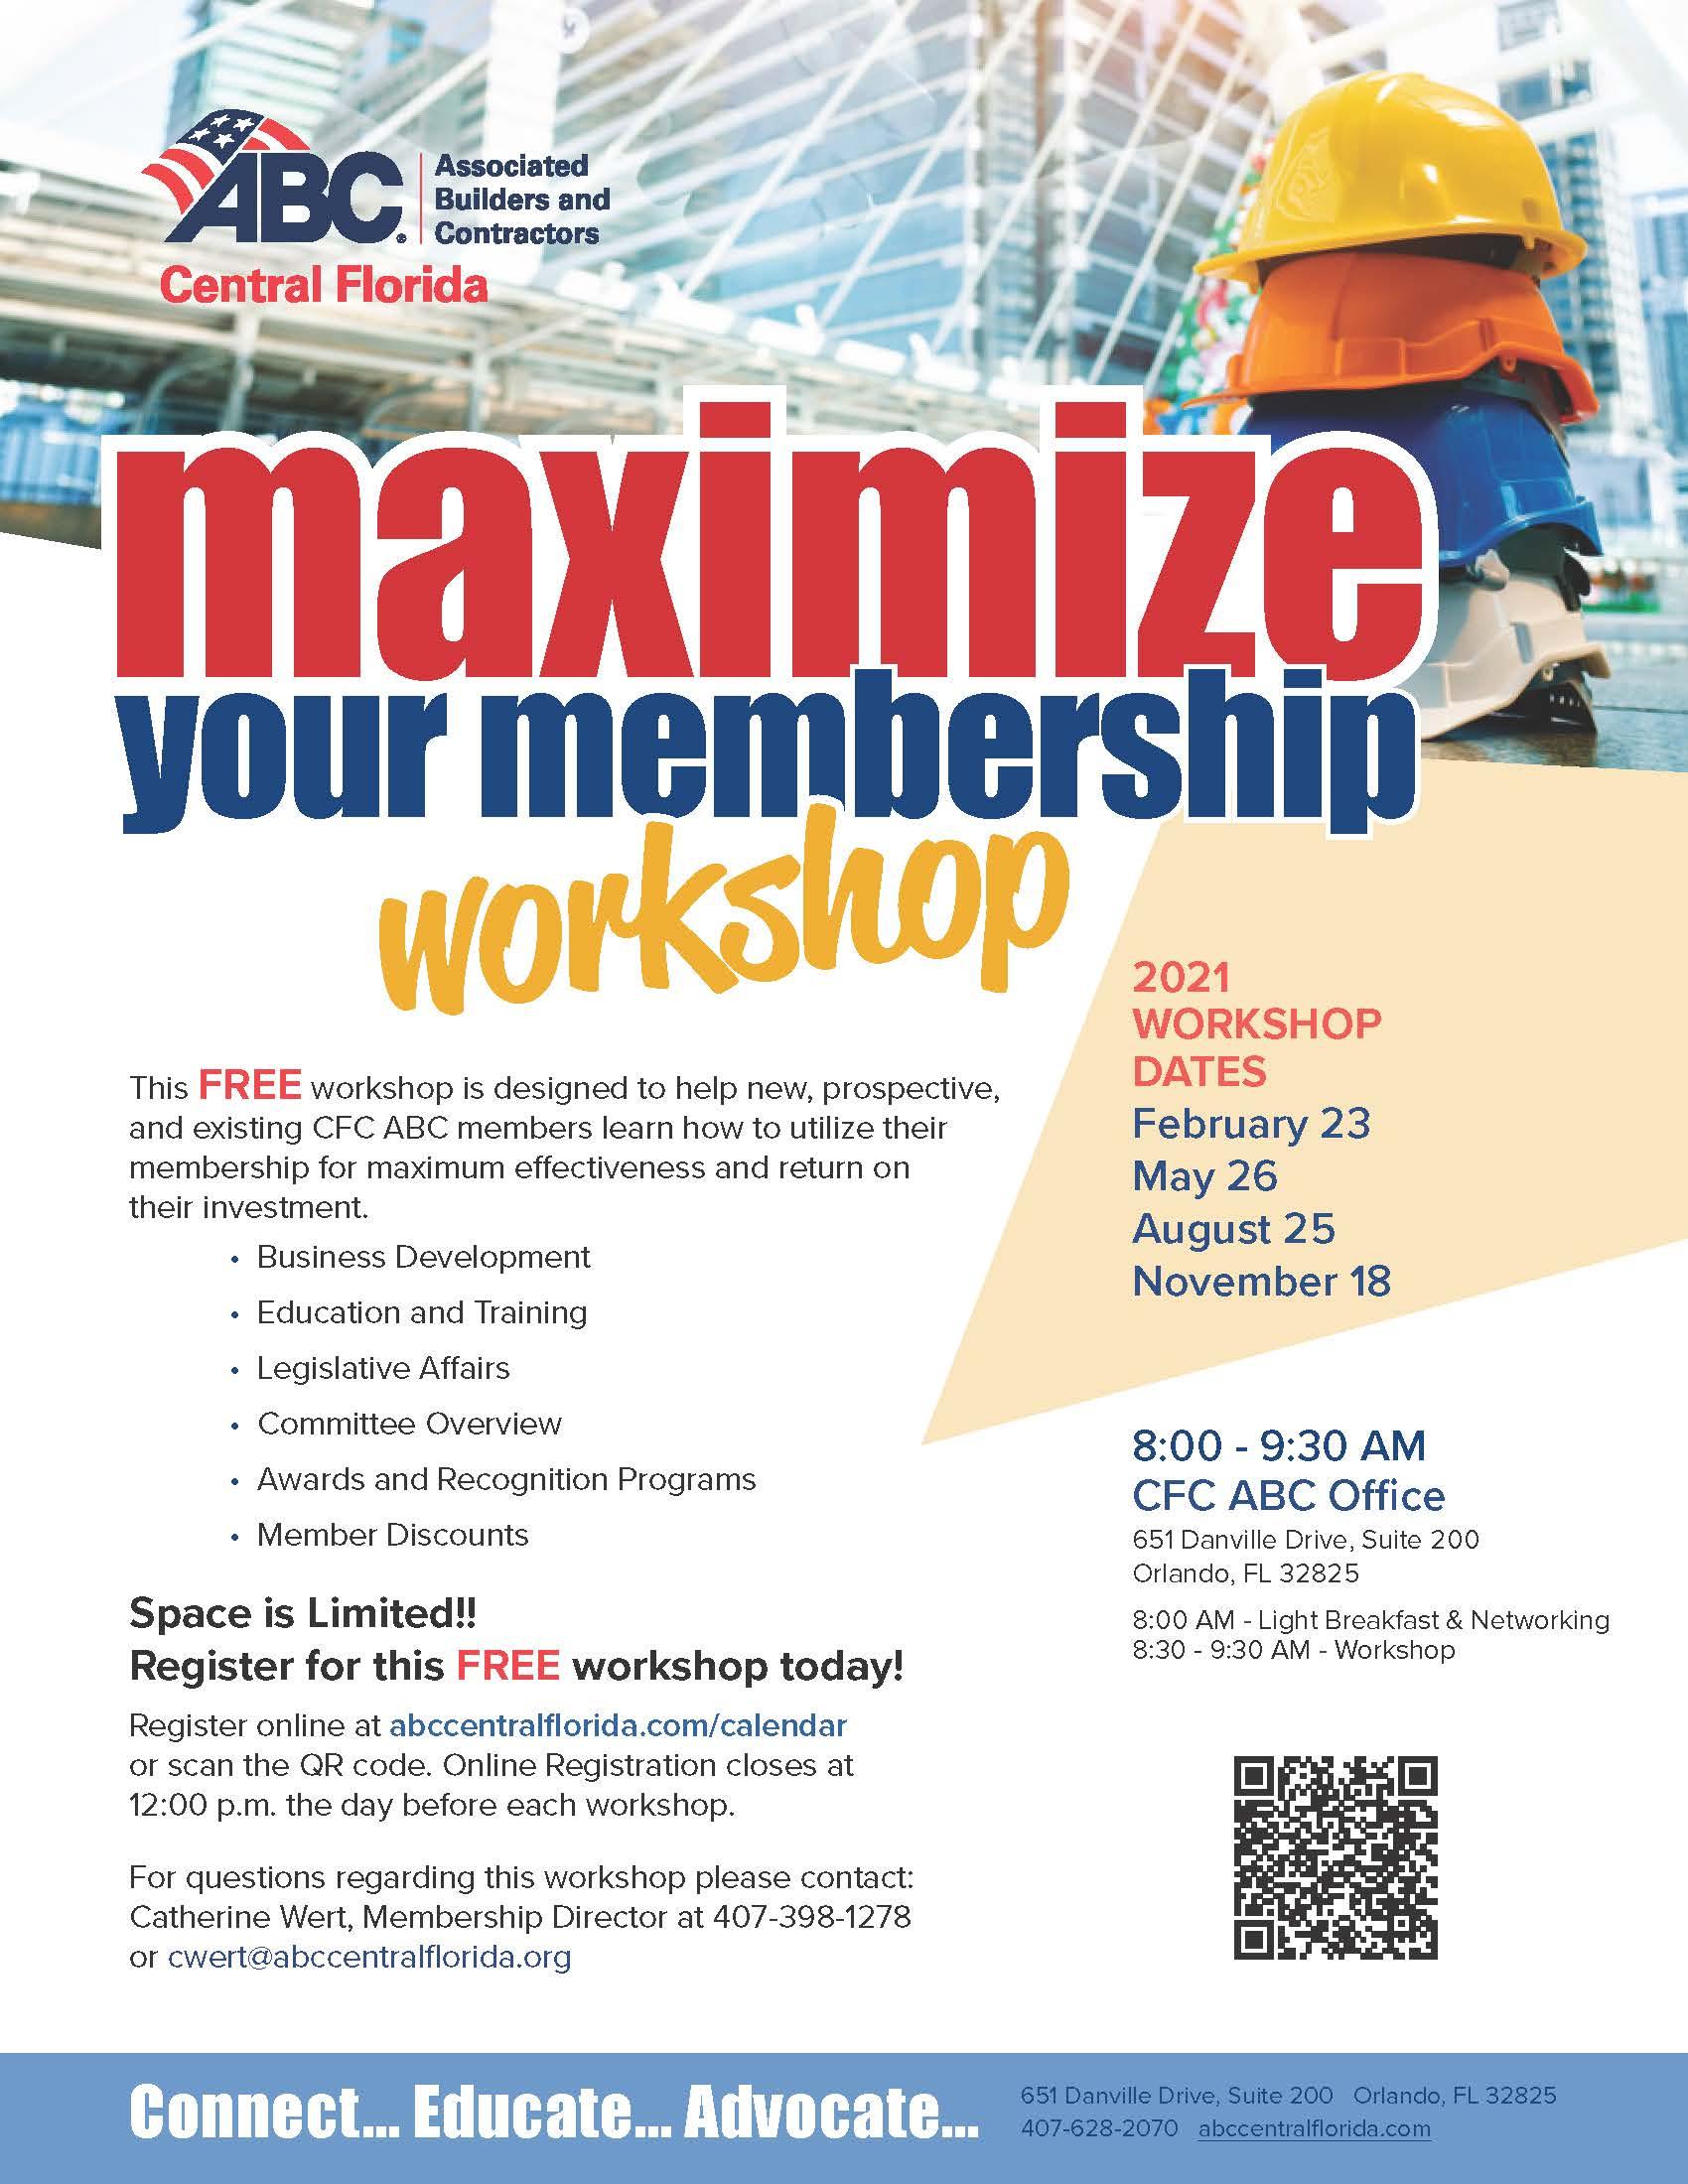 Maximize Your Membership Workshop